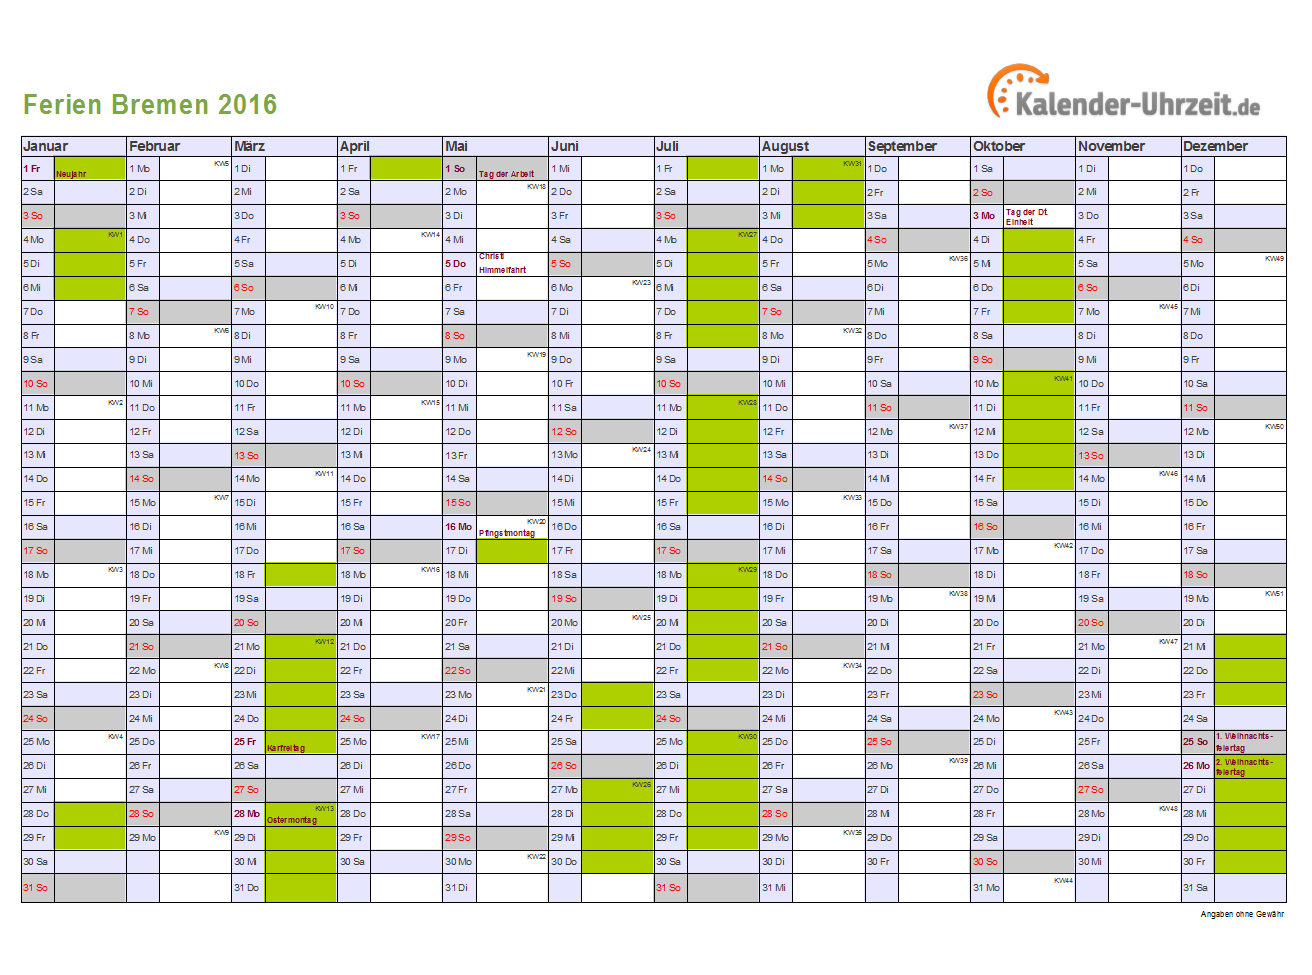 ferienkalender 2015 bw zum ausdrucken new calendar template site. Black Bedroom Furniture Sets. Home Design Ideas